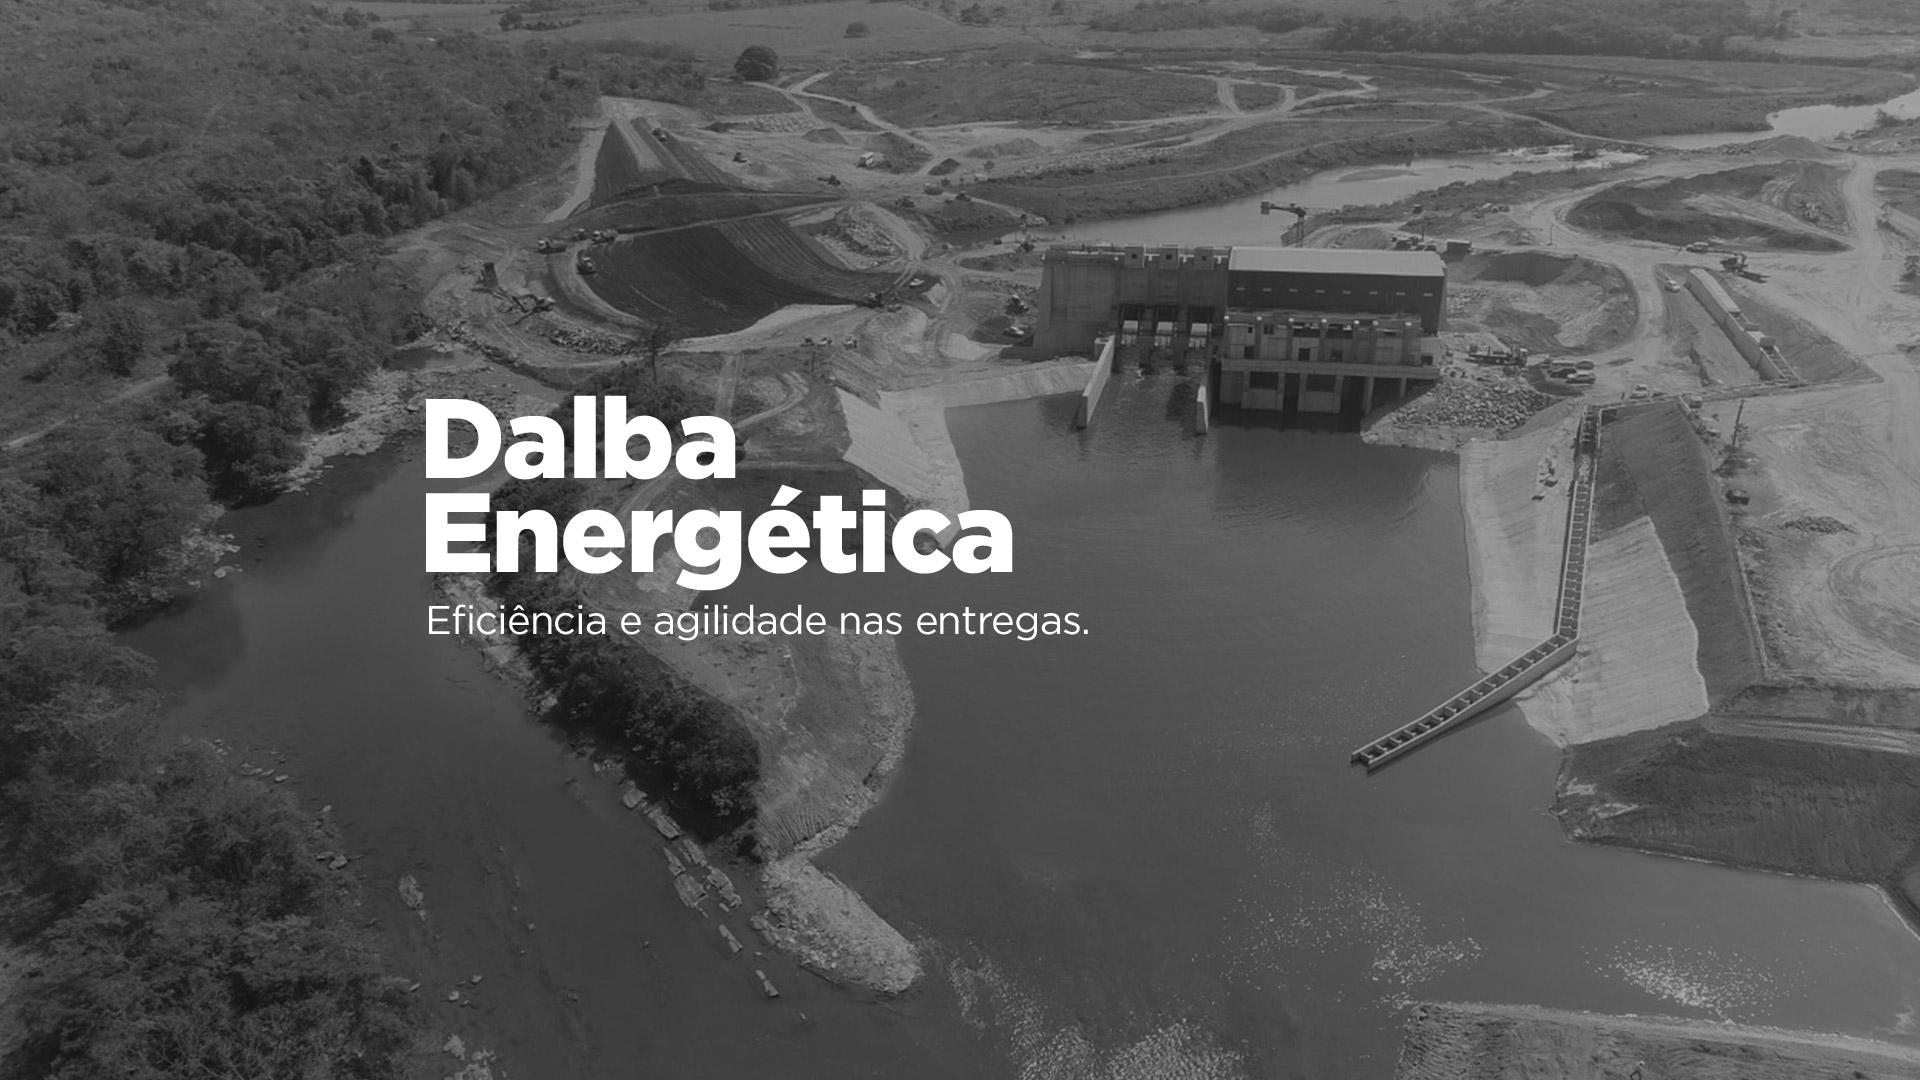 Dalba Energética